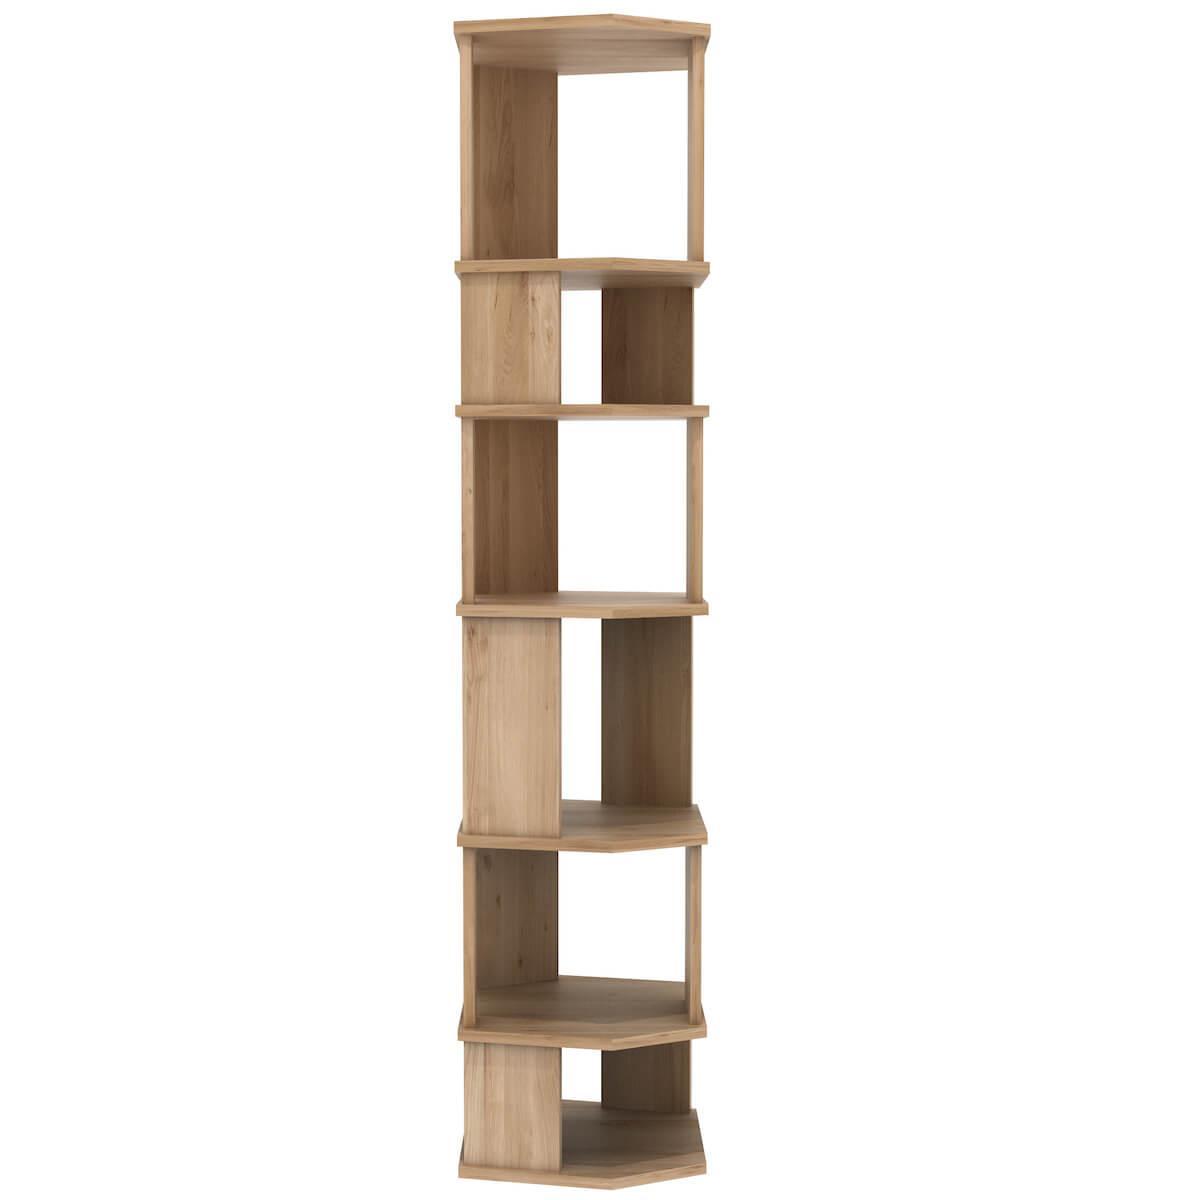 Étagère colonne STAIRS Ethnicraft chêne